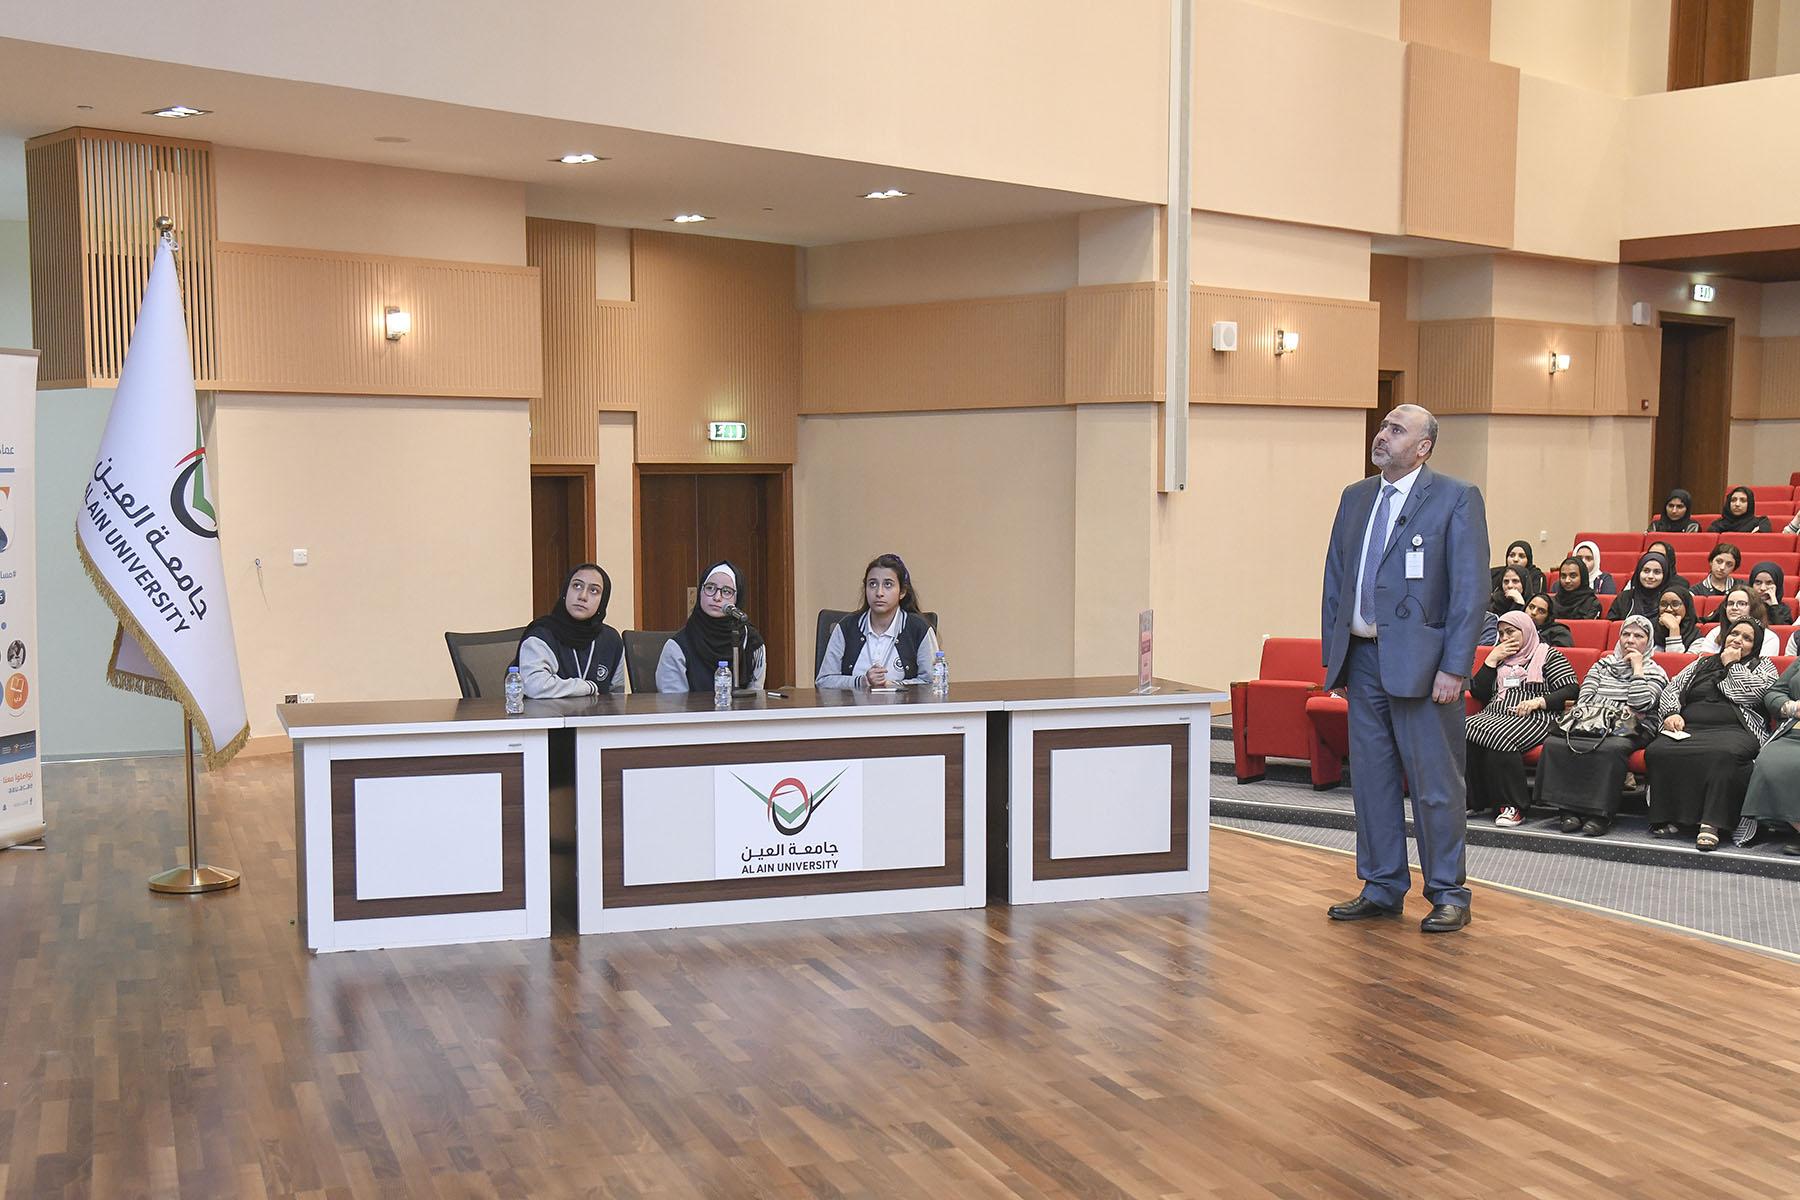 Ninth day (Emirates Private School - Abu Dhabil VS Royal American School)